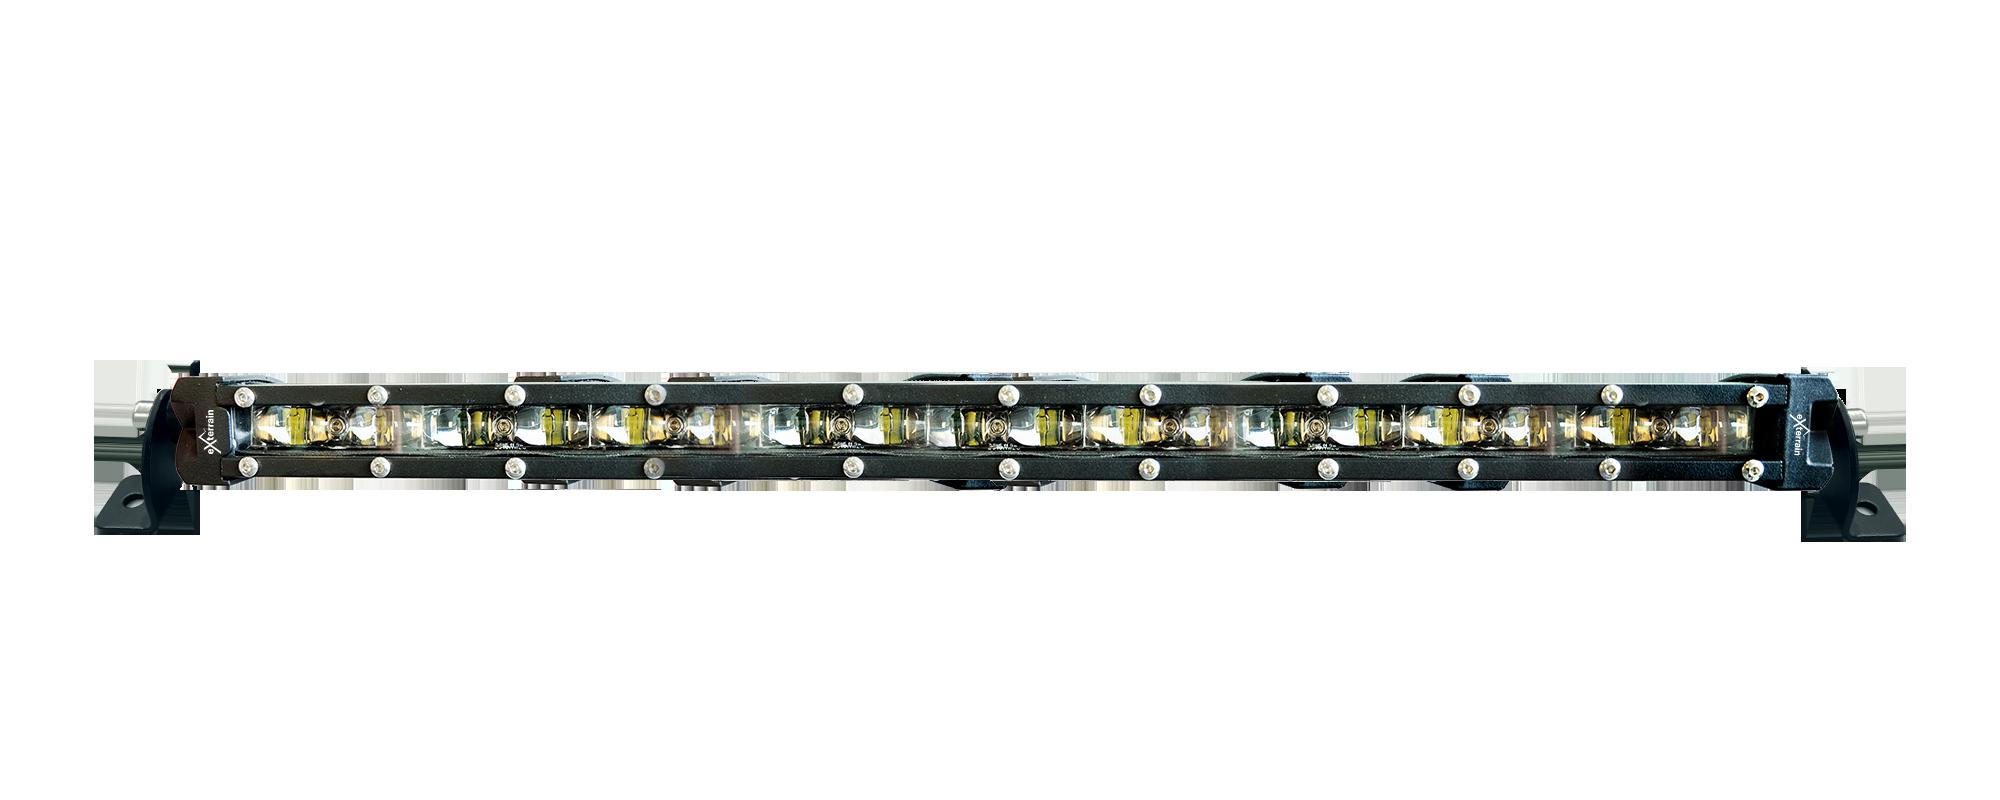 RAVEN S SERIES - SUPER SLIM SINGLE ROW LIGHT BARS